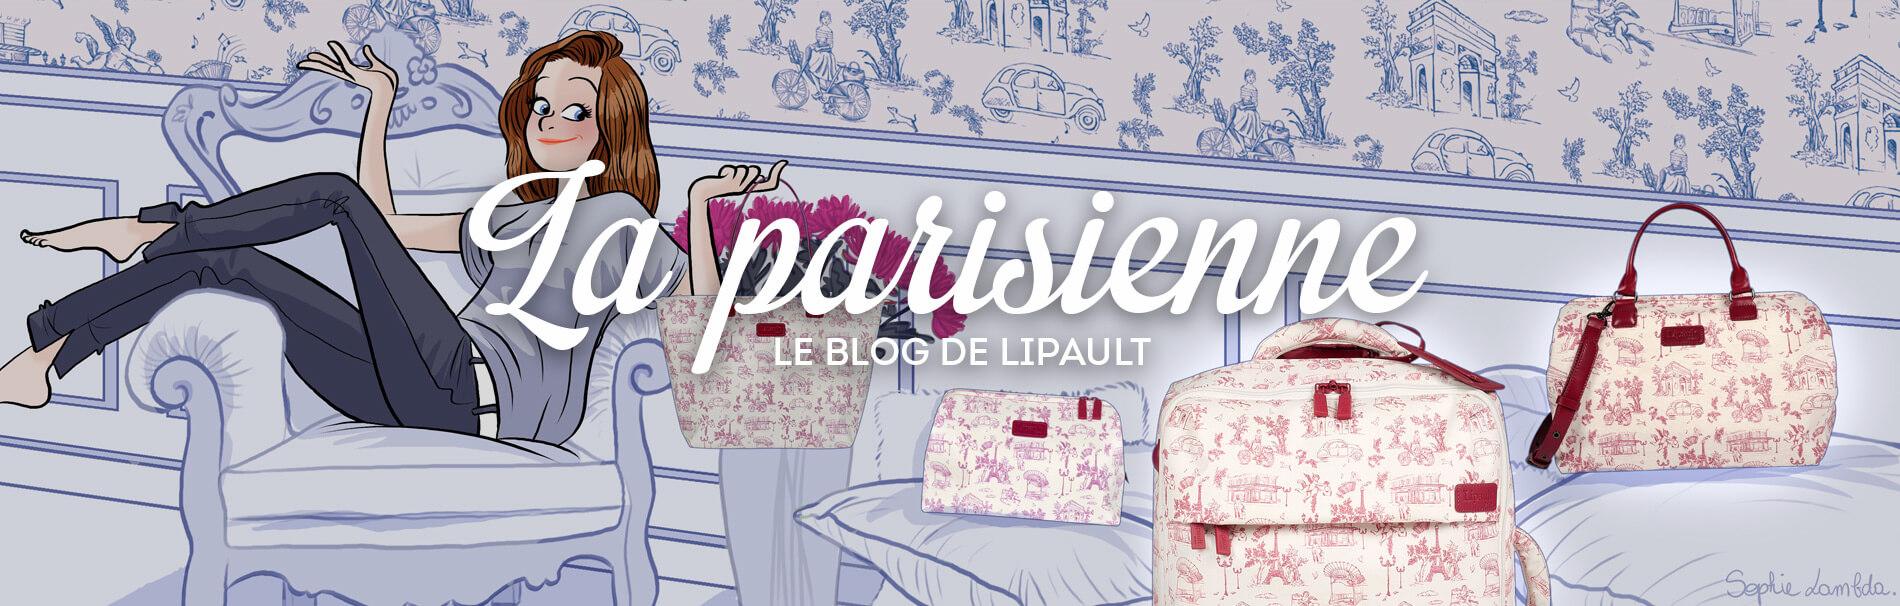 La Parisienne: The blog of lipault